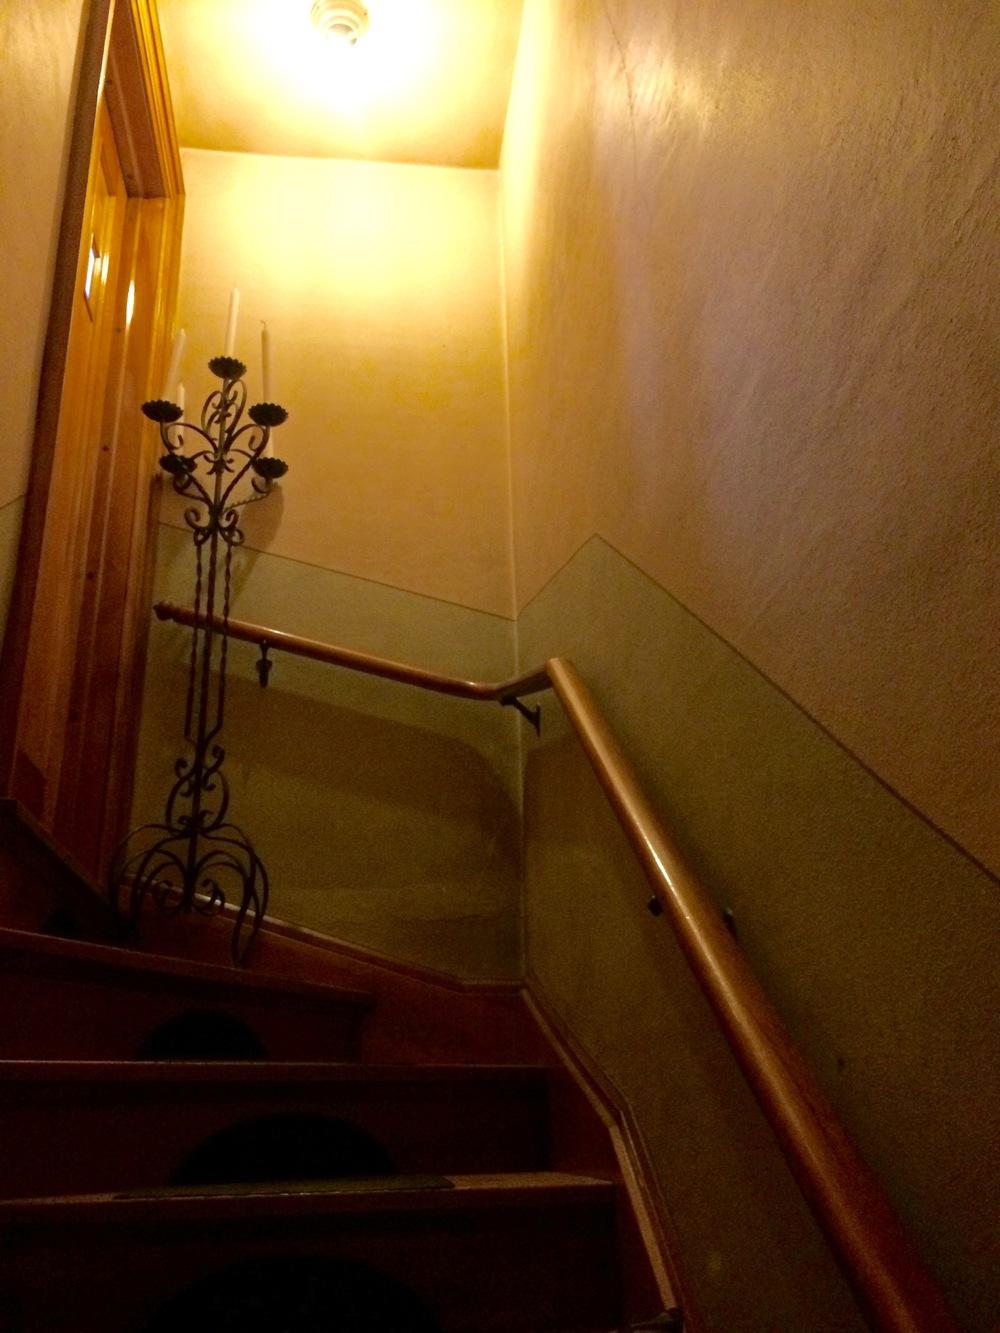 7424 stair case.